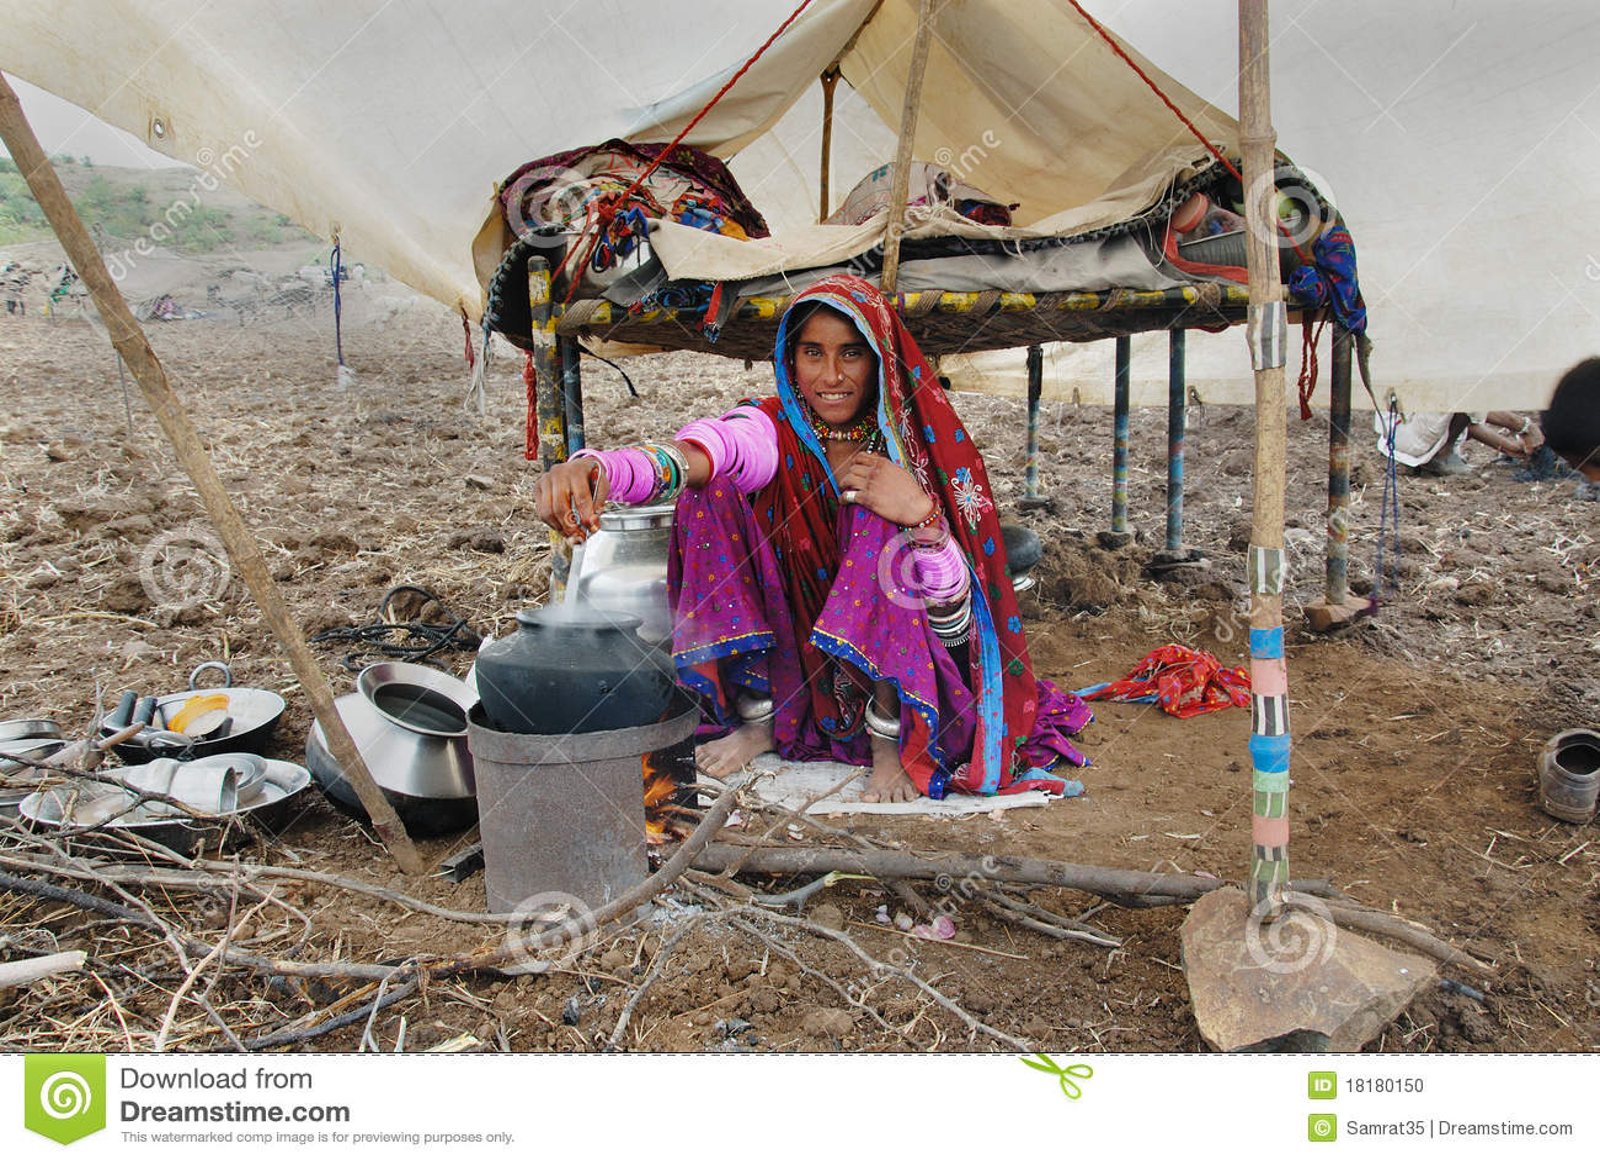 Nomad People In India Editorial Image | CartoonDealer.com ...